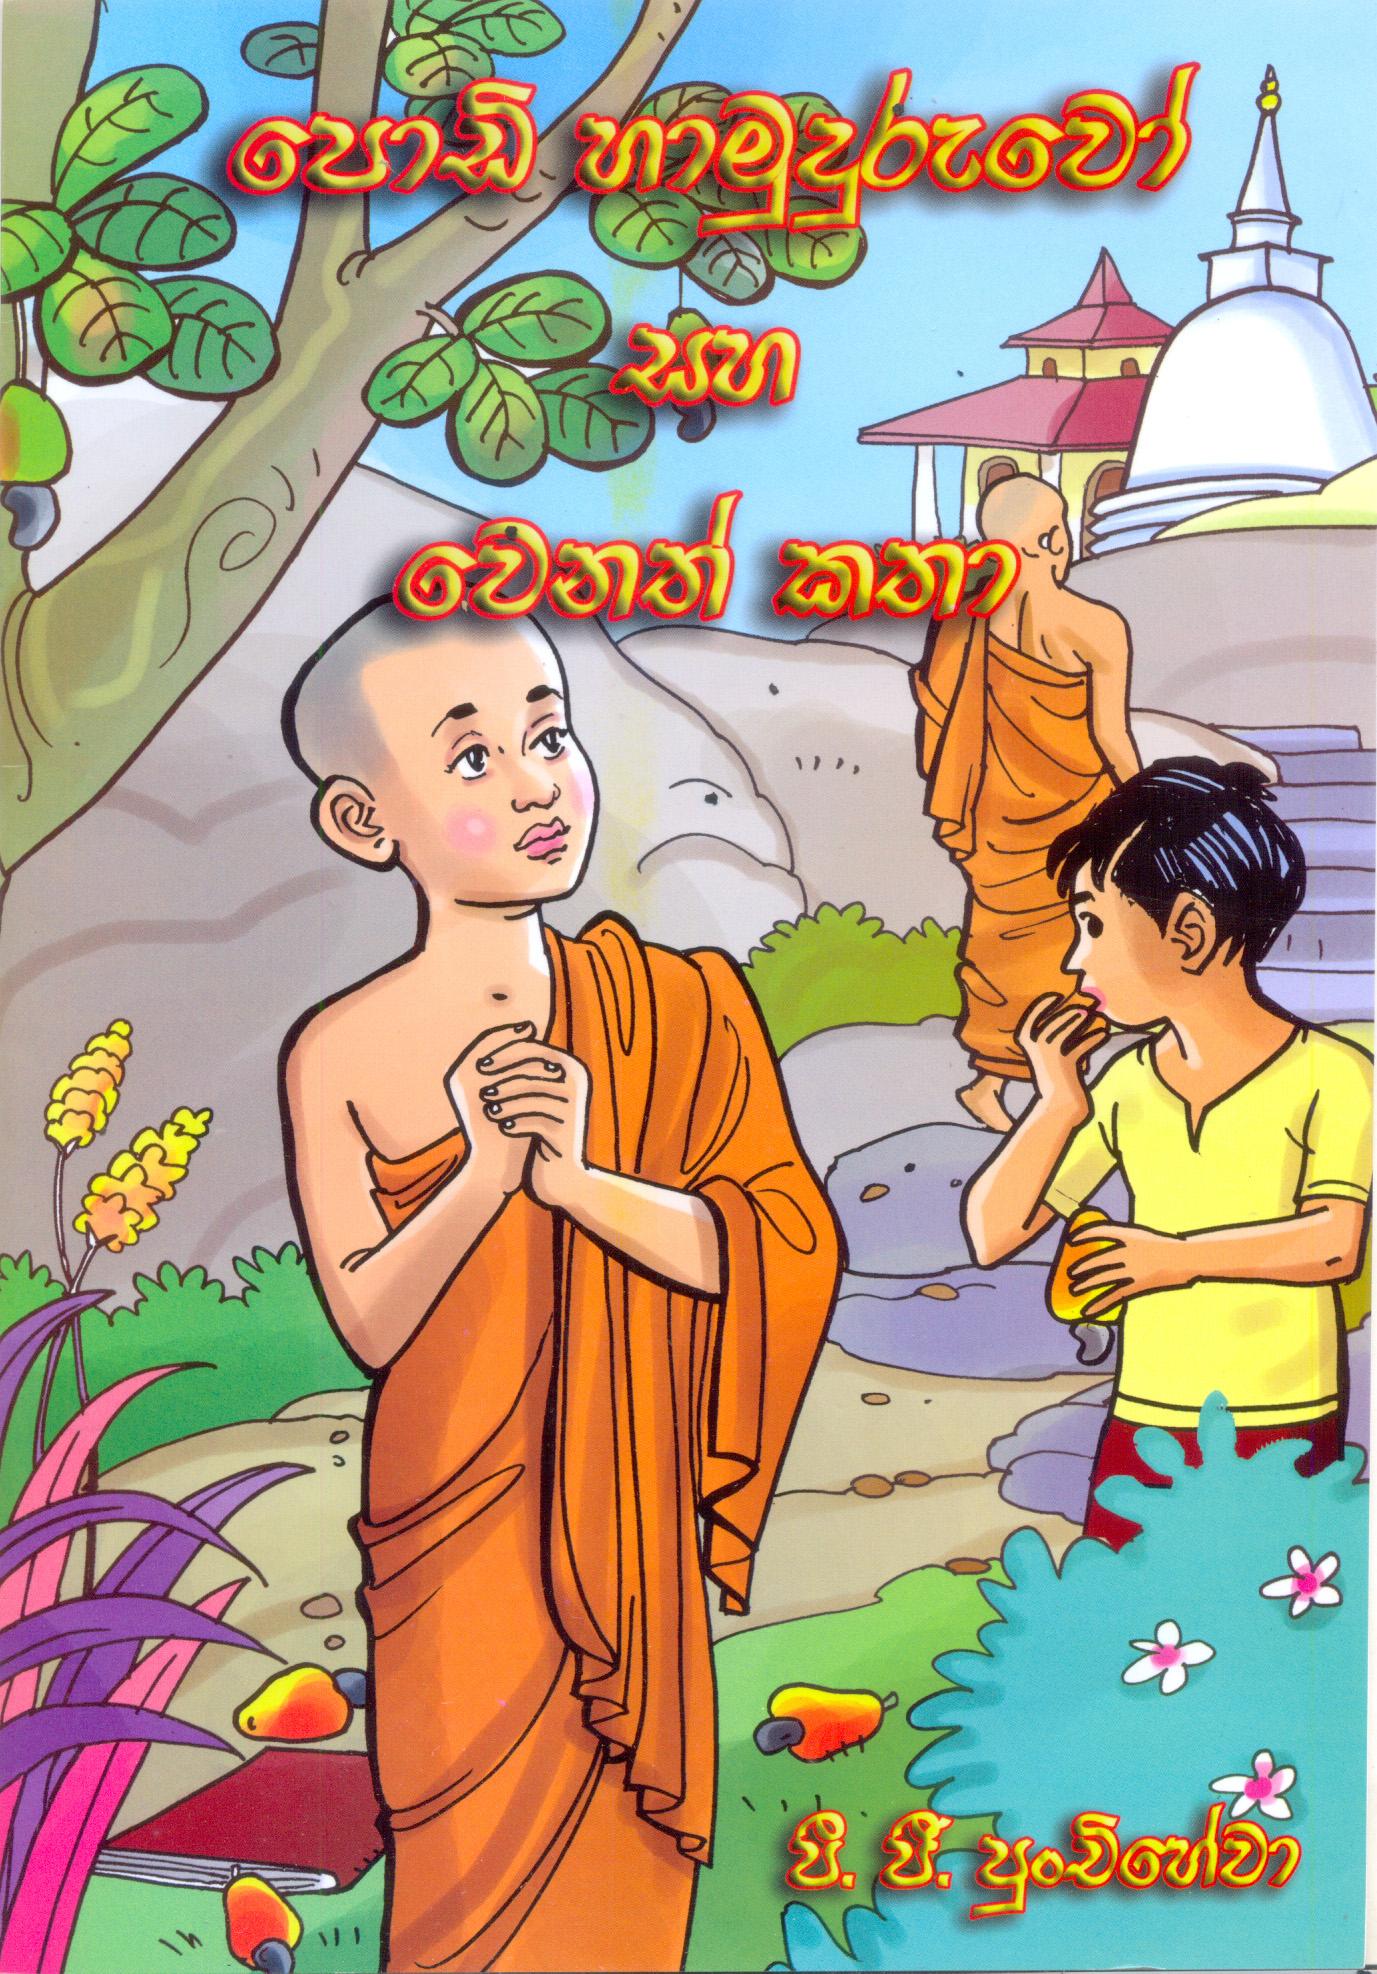 Podi Hamuduruwo Saha Wenath Katha